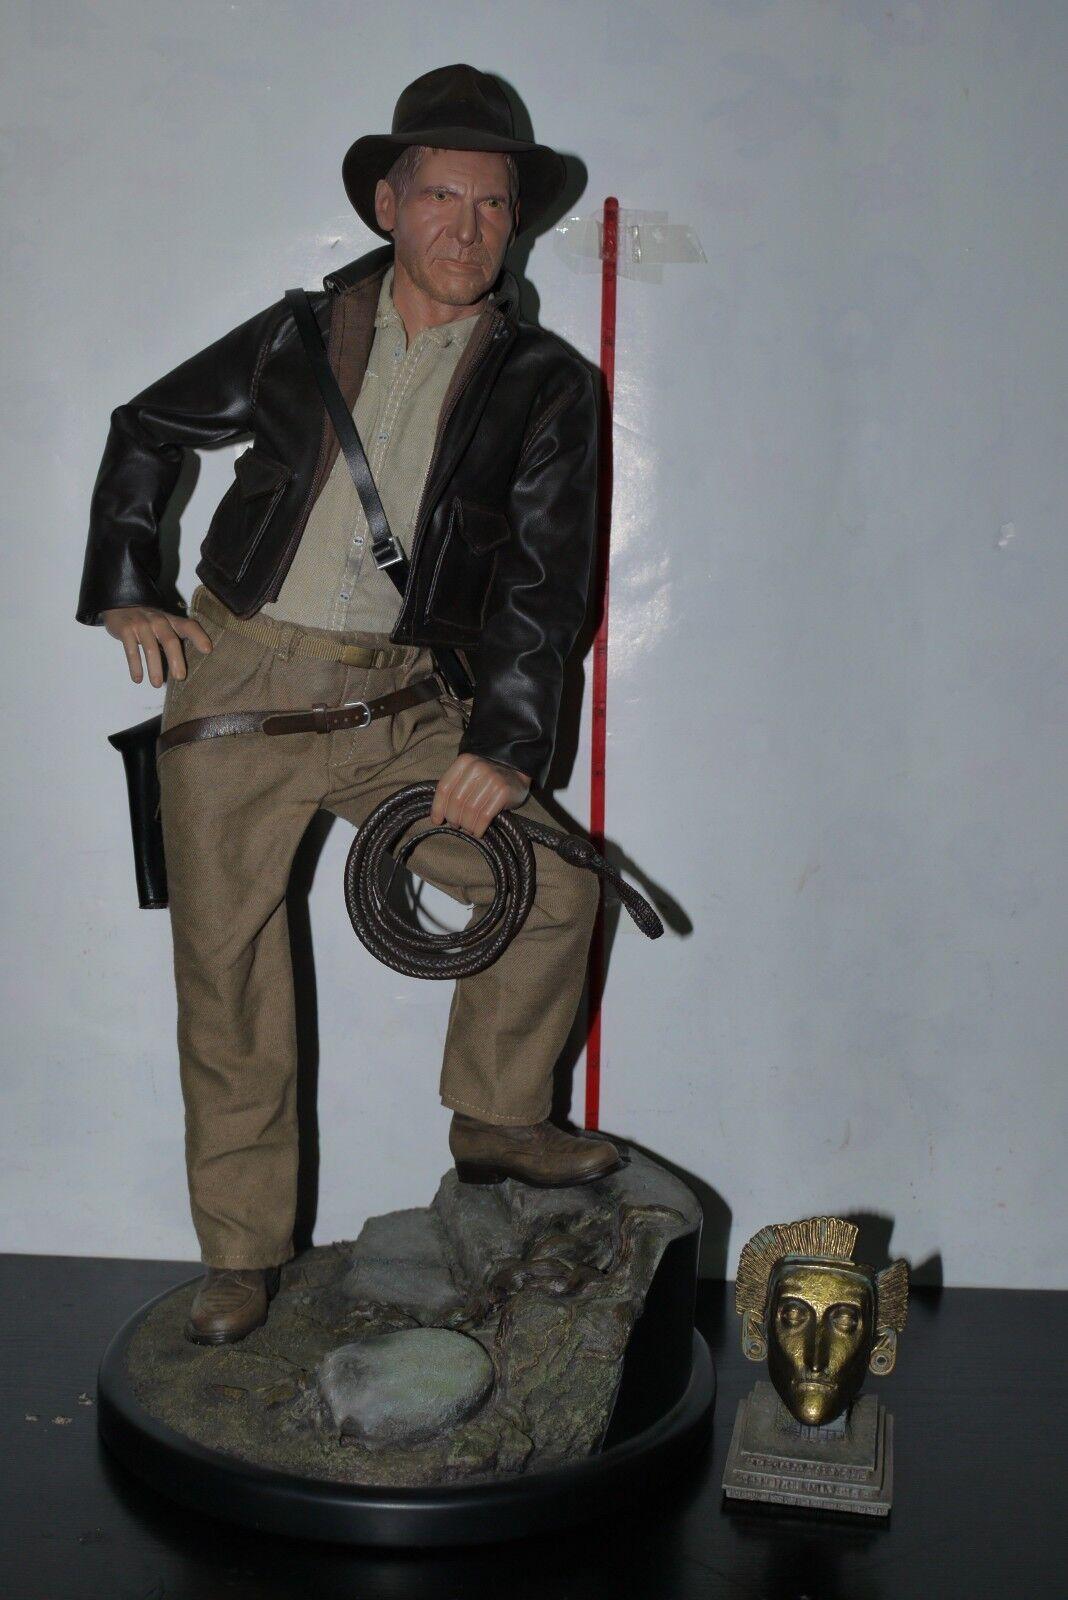 SIDESHOW Indiana Jones IV Cristal Cráneo Premium Format exclusiva estatua de 44 300